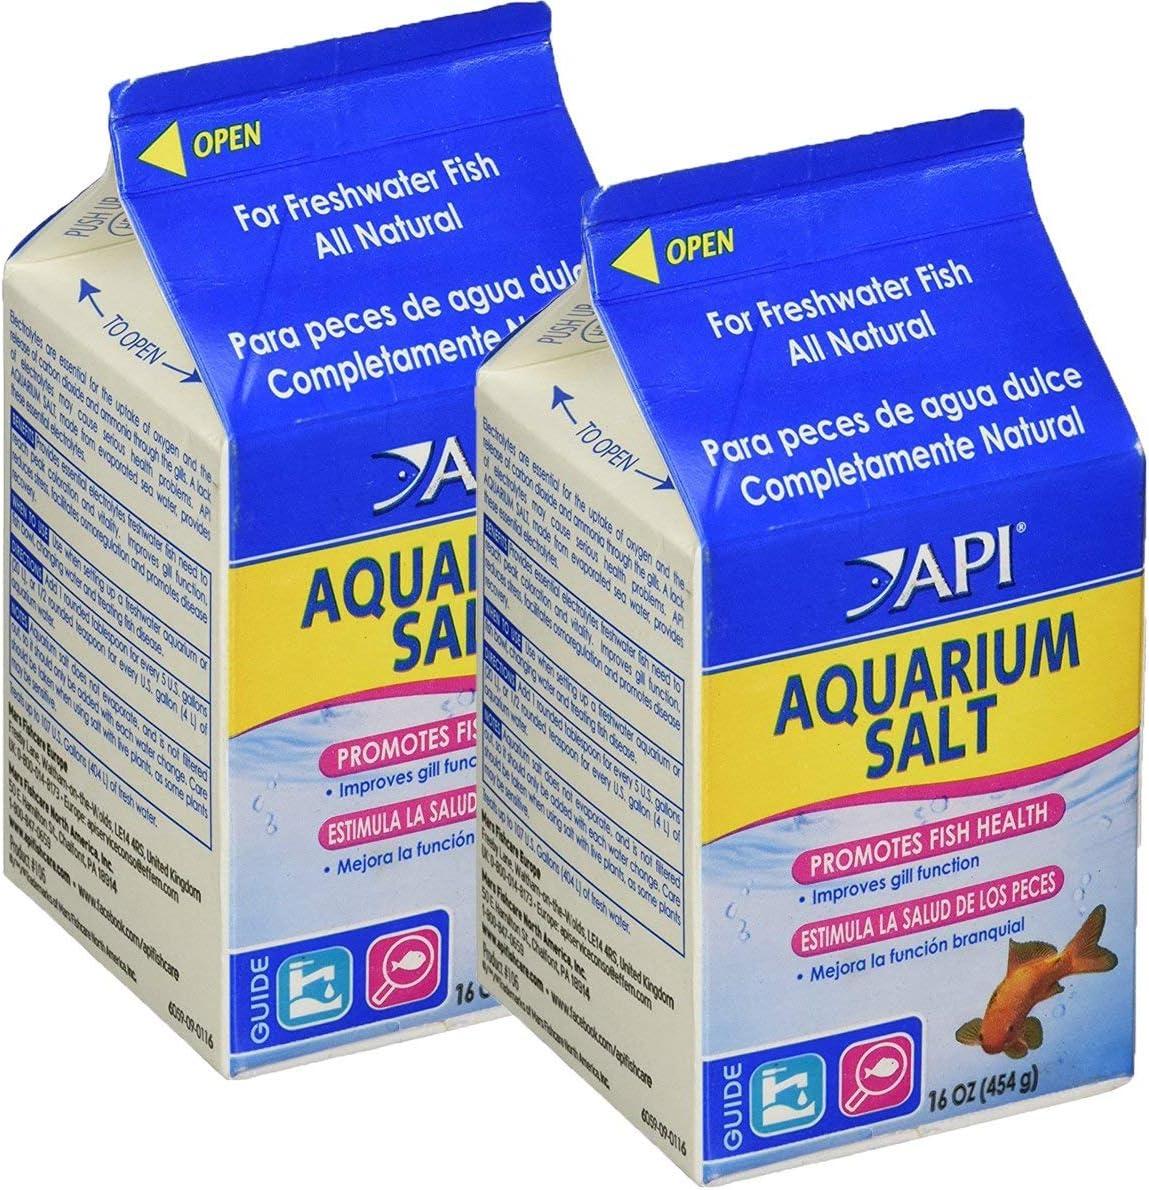 Aquarium famous Salt 32oz Weekly update